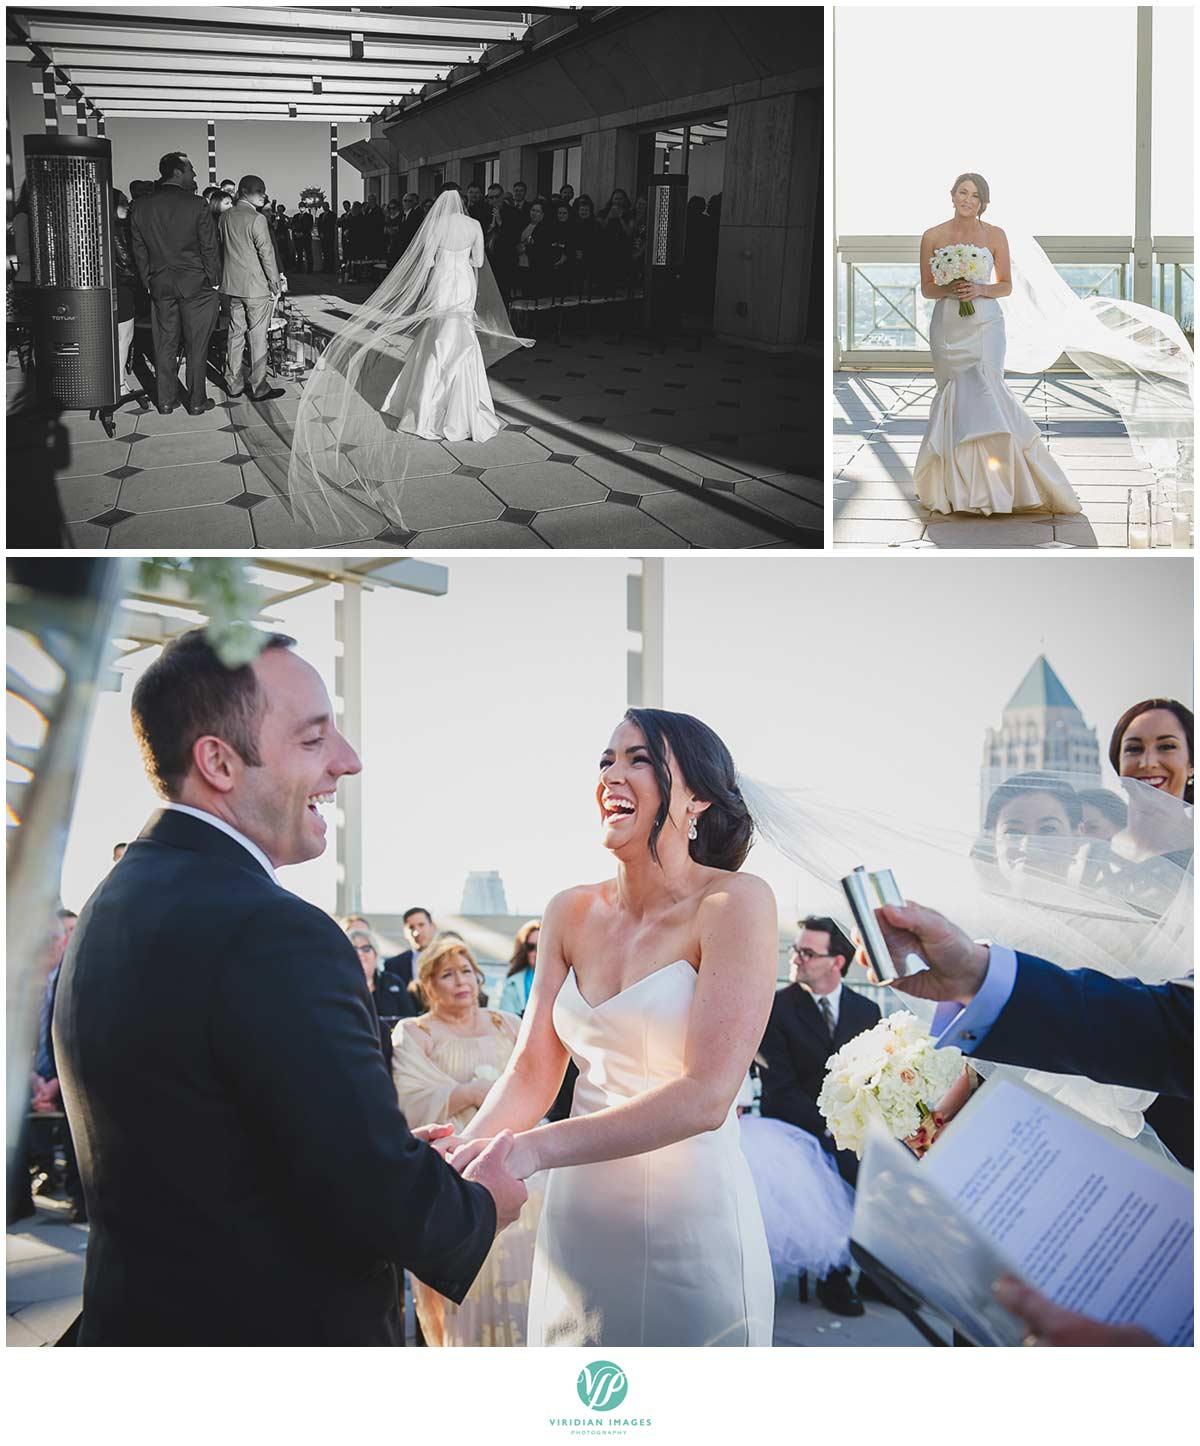 Peachtree_Club_Atlanta_Wedding_Viridian_Images_Photography-25